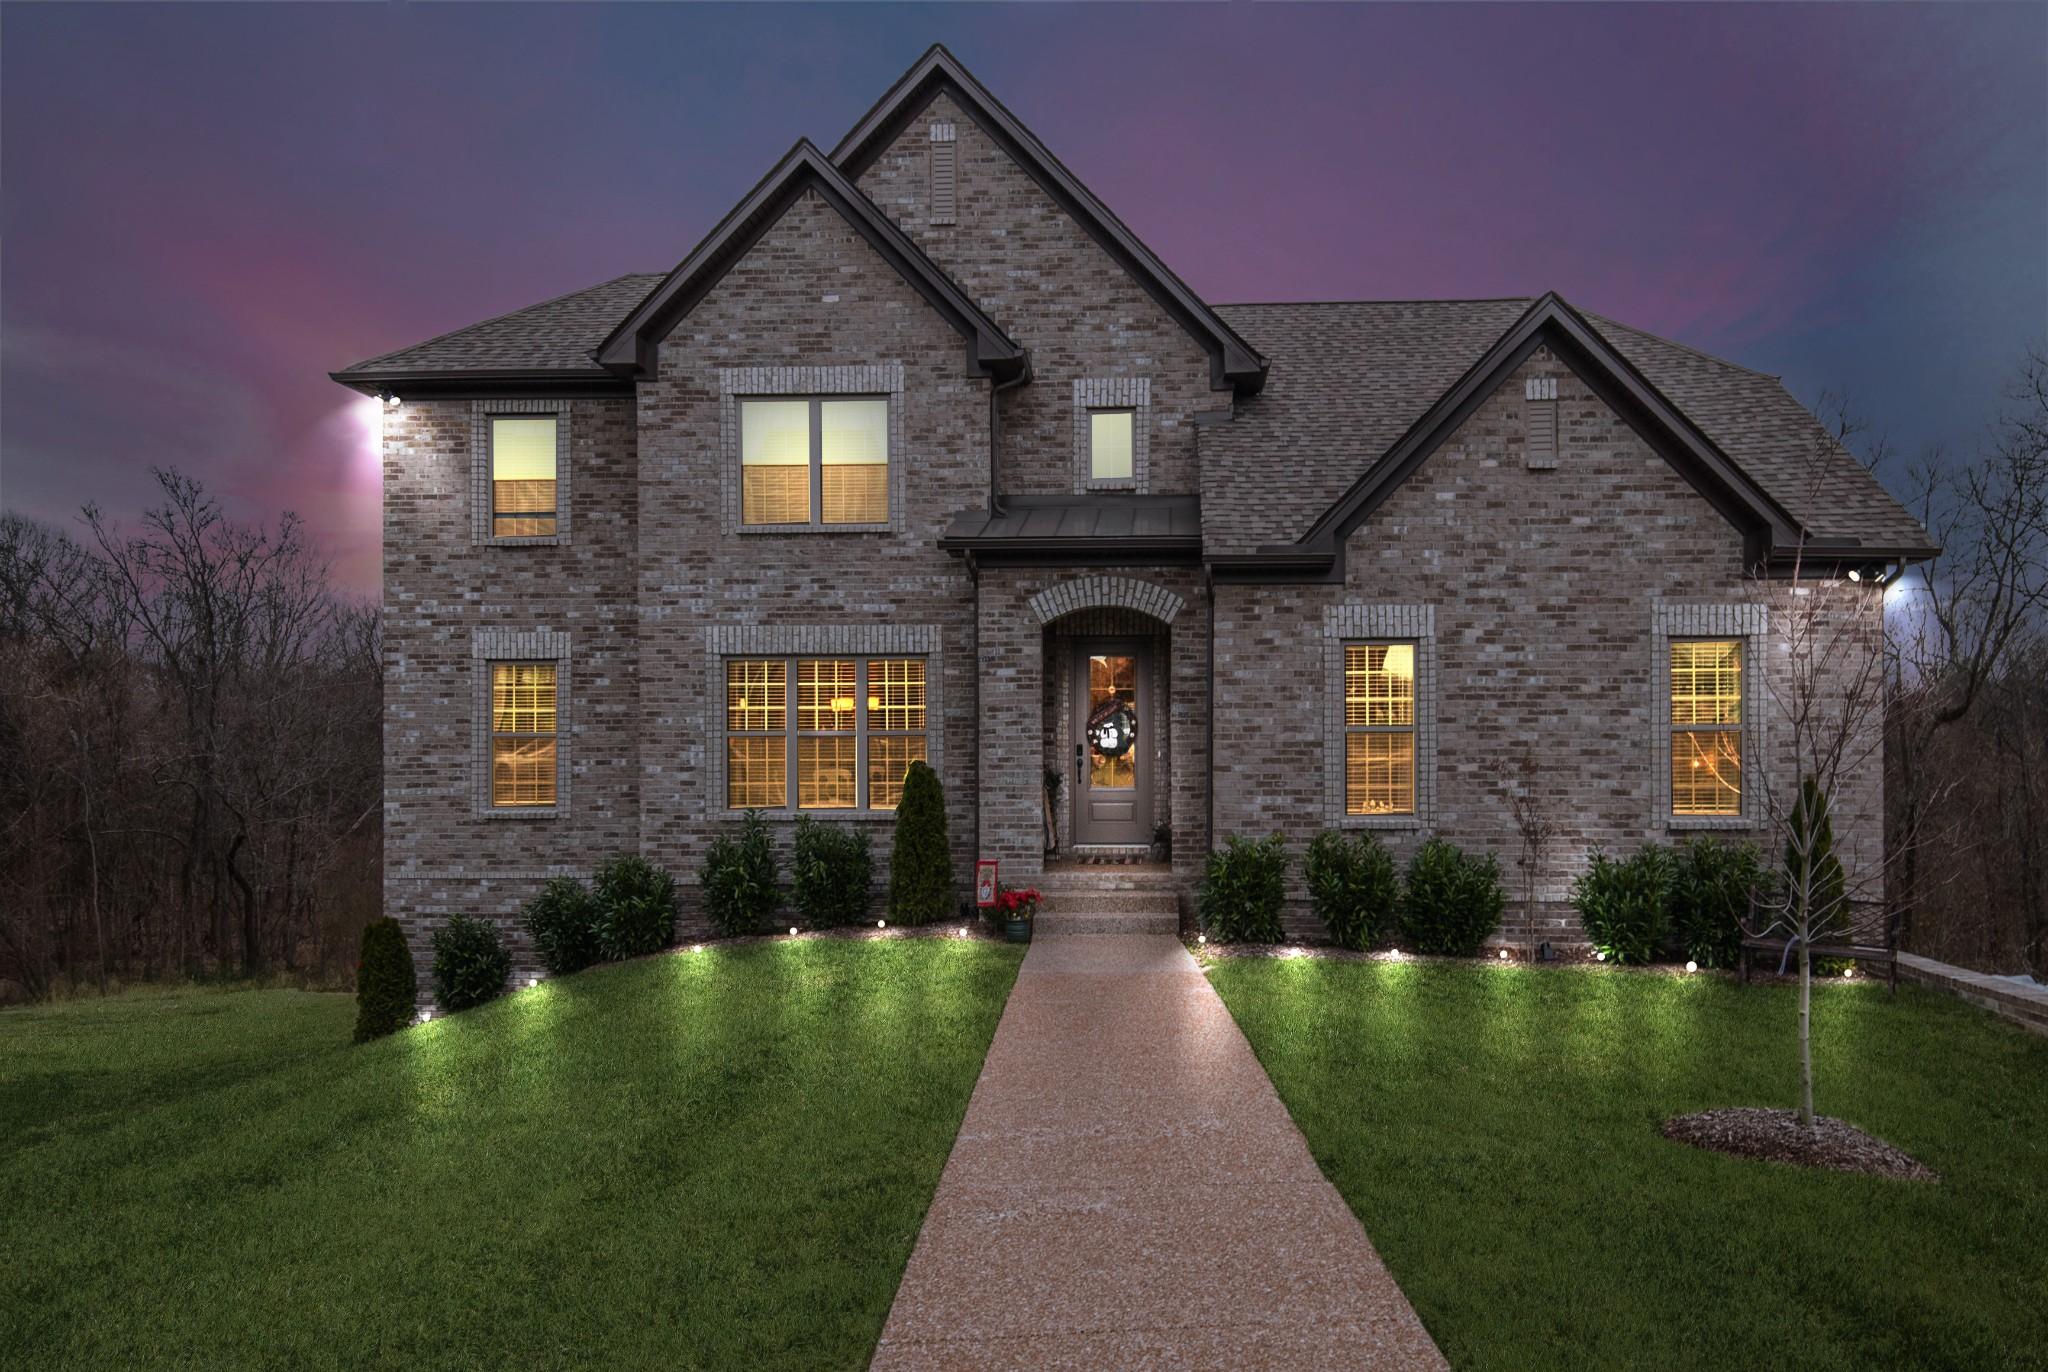 1012 Atherton Ct, Hendersonville, TN 37075 - Hendersonville, TN real estate listing